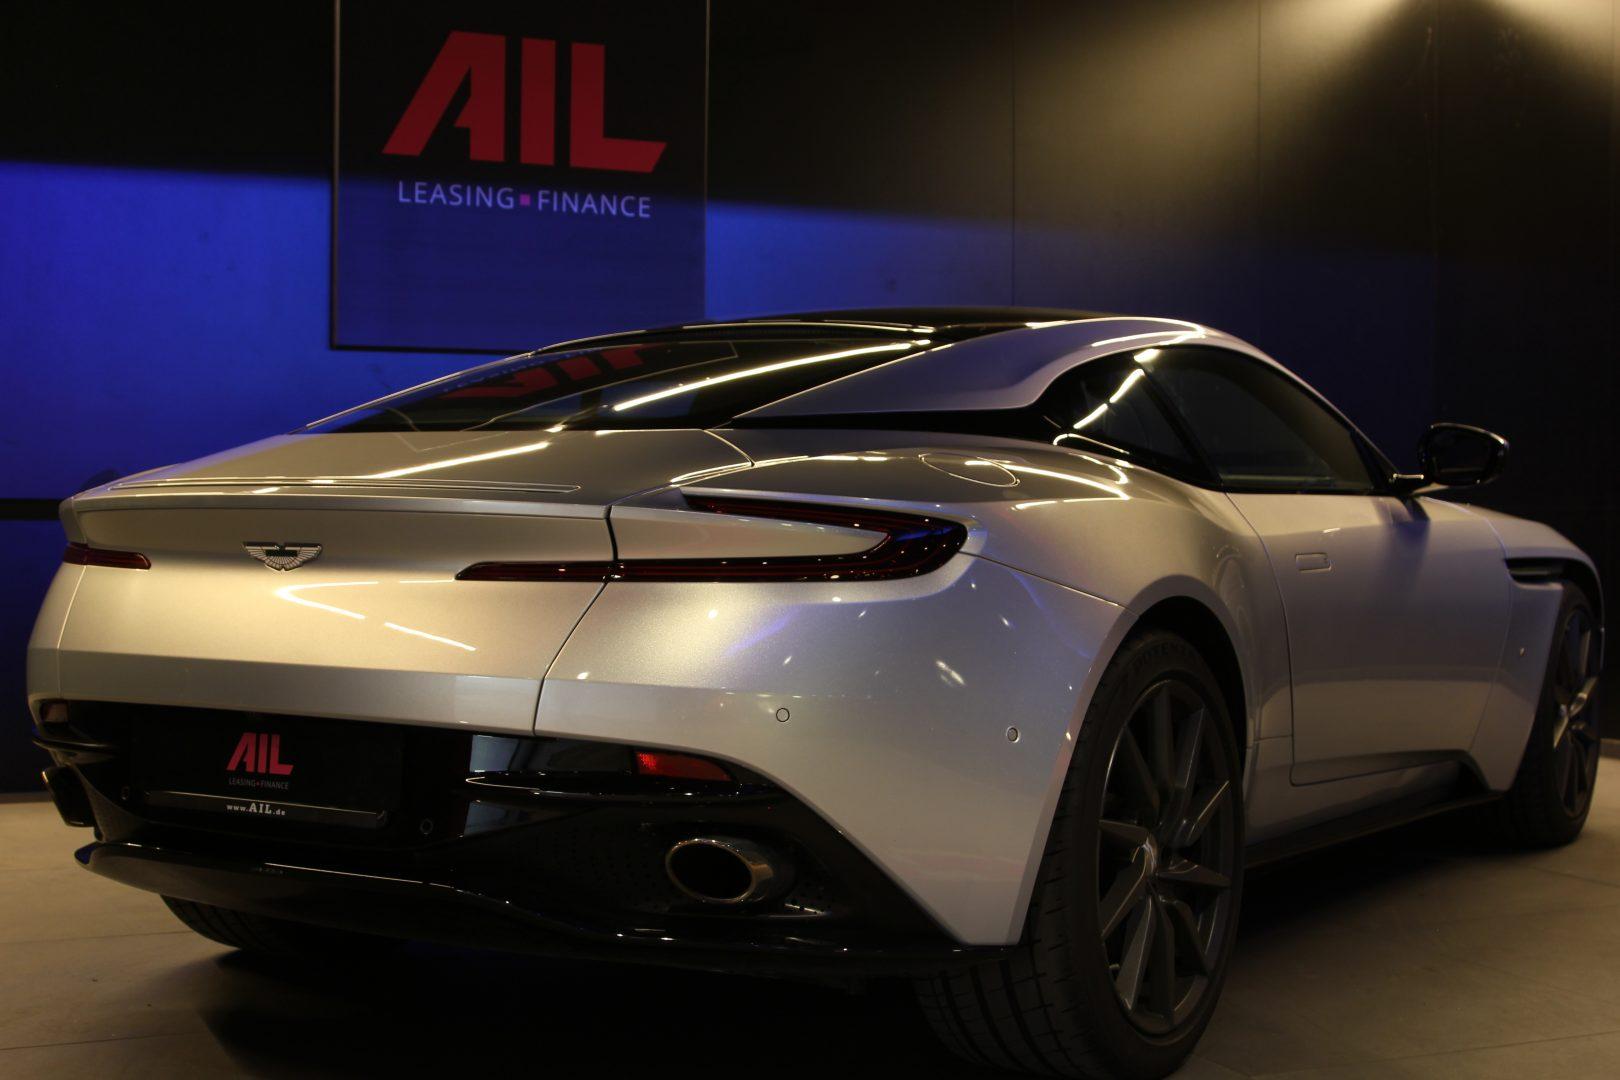 AIL Aston Martin DB11 Coupe 5.2 V12 4